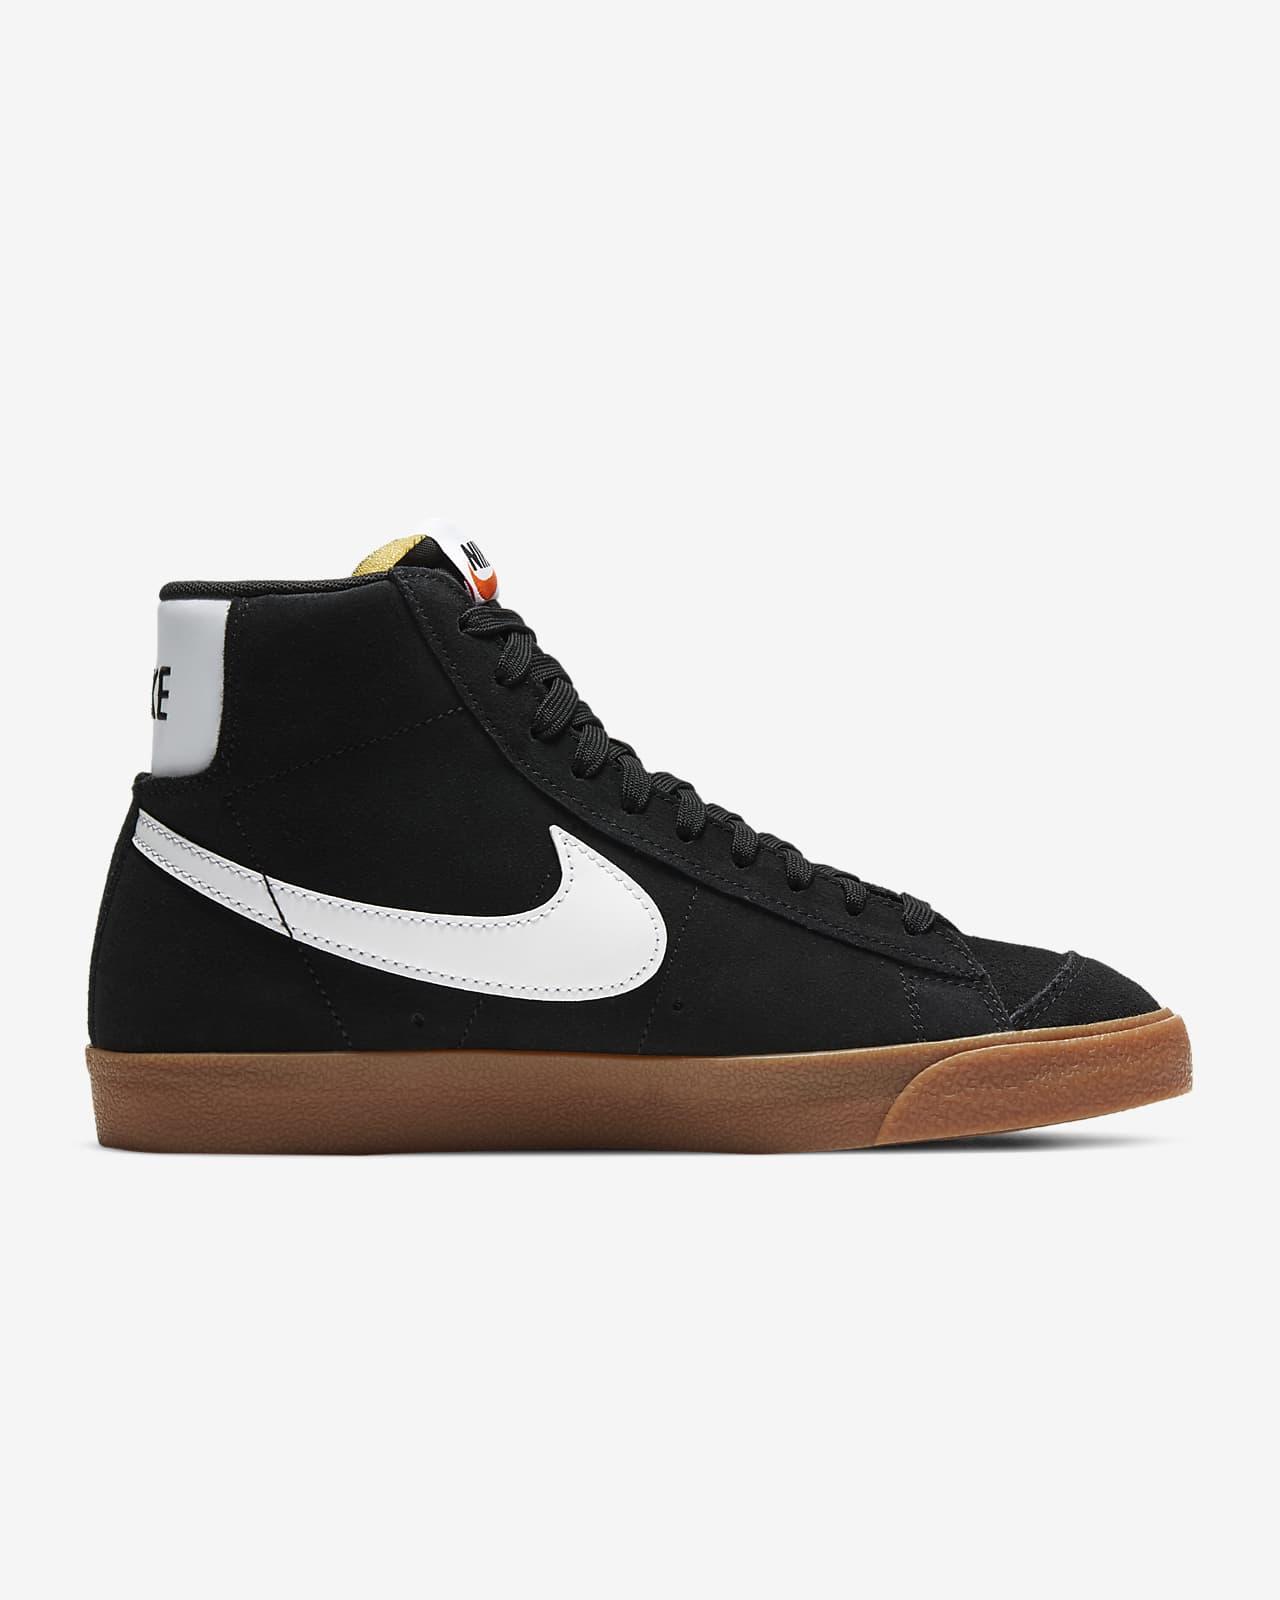 Chaussure Nike Blazer Mid '77 pour Femme